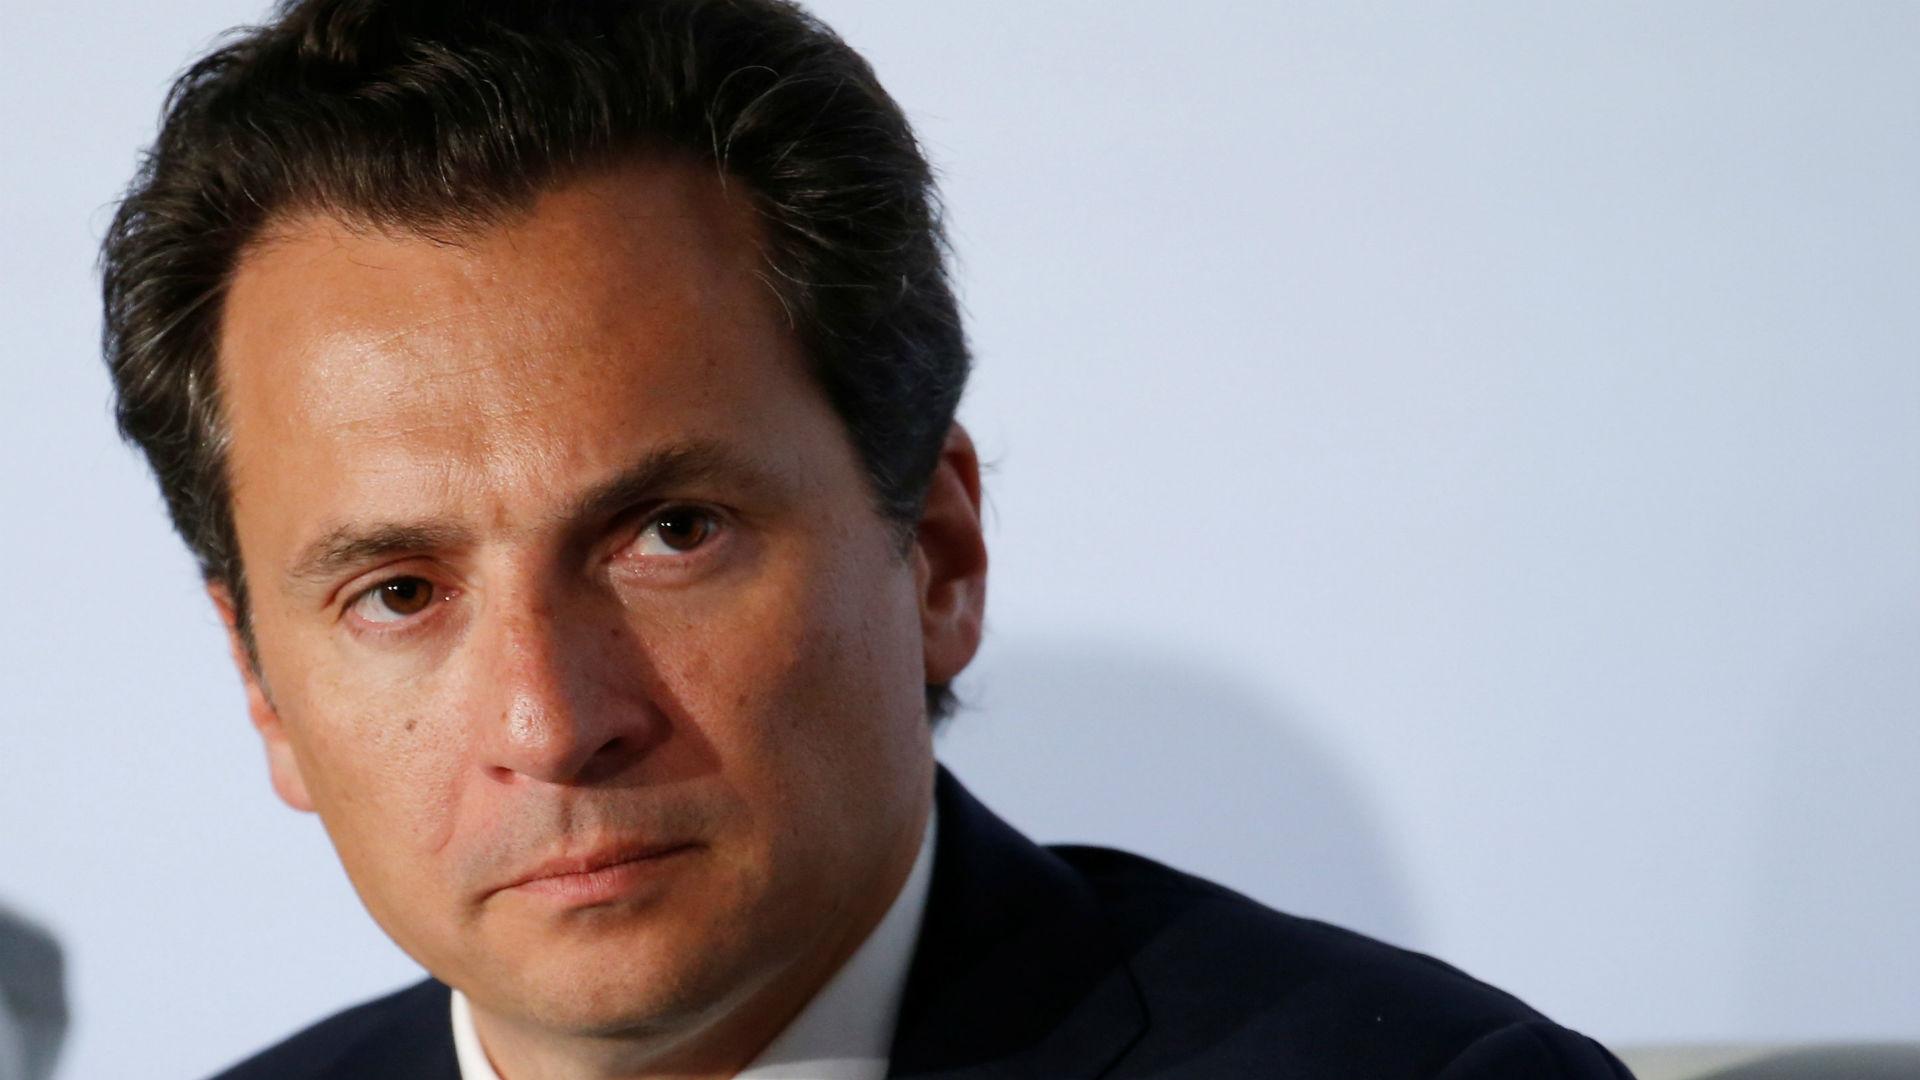 Emilio Lozoa, el hombre que amenaza con desatar una tormenta política, llegó a México.